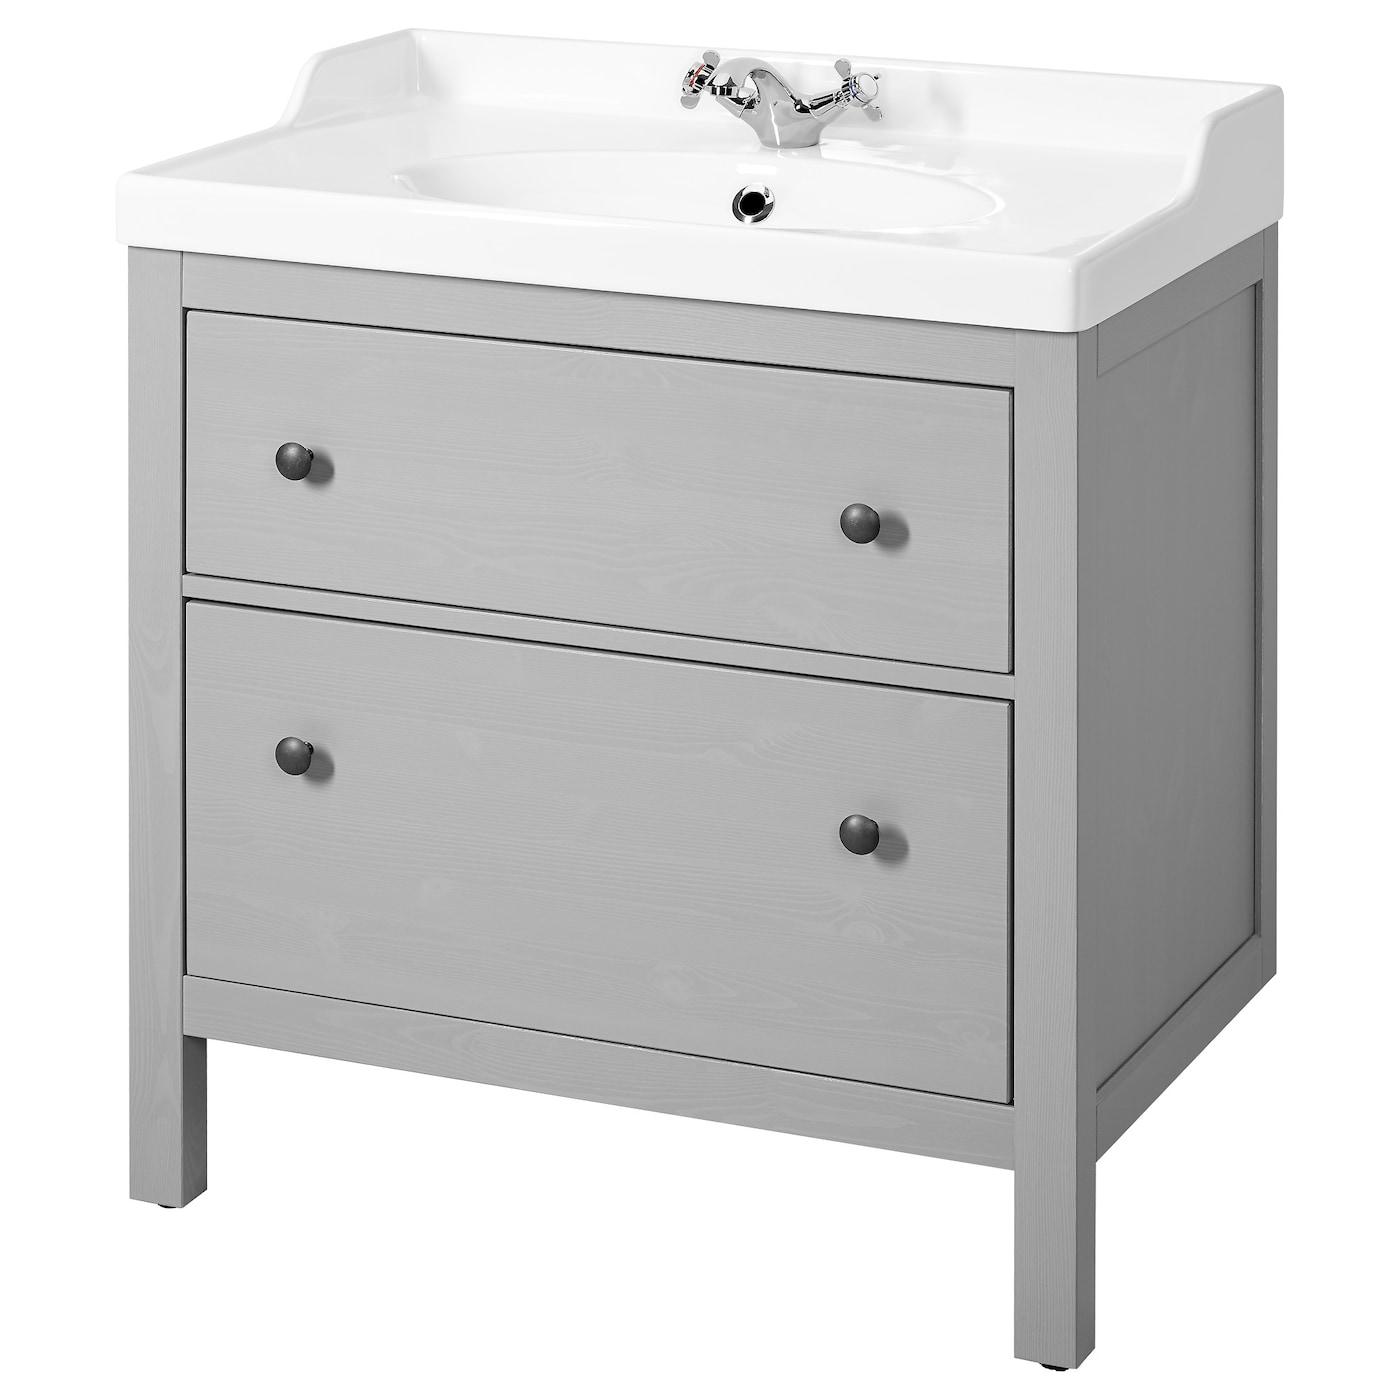 GODMORGON Wäscheschrank - IKEA